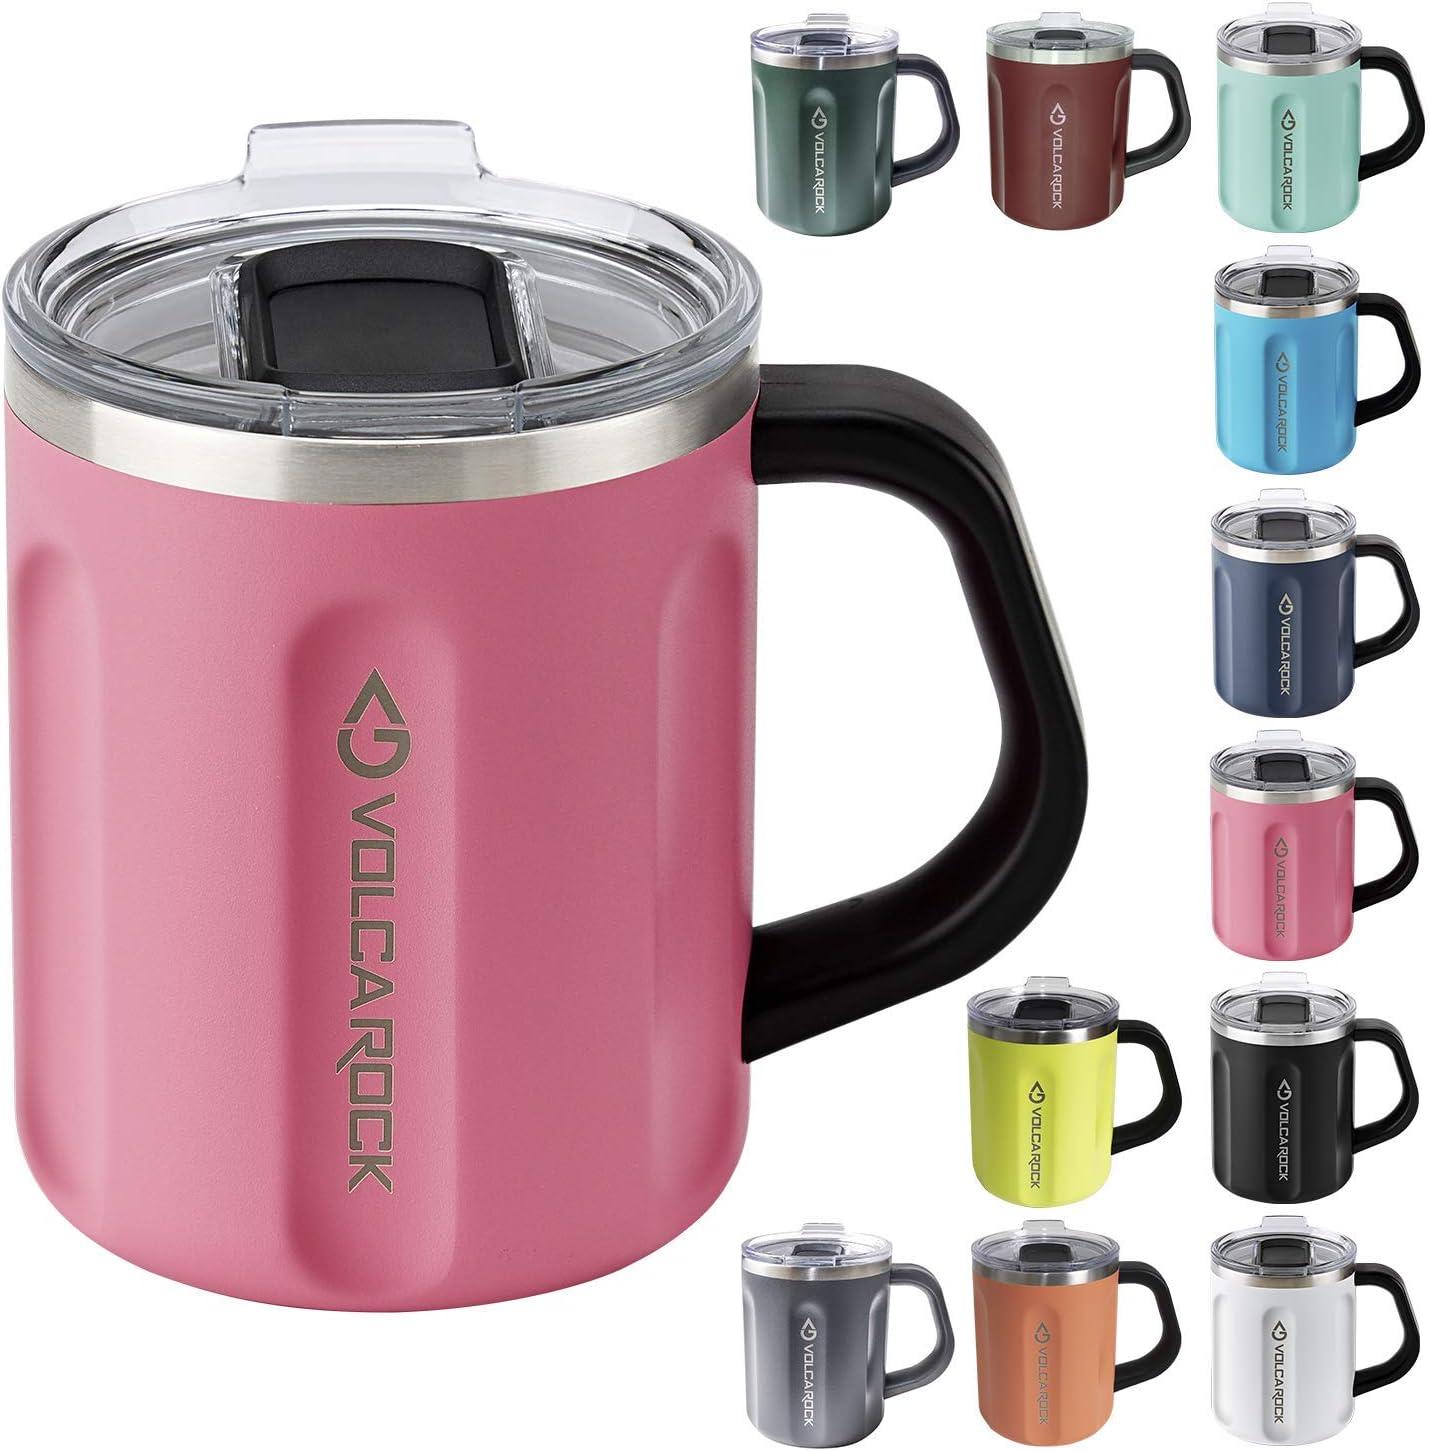 VOLCAROCK Coffee Mug with Handle, 16oz Insulated Stainless Steel Reusable Coffee Cup, Double Wall Coffee Travel Mug, Keep Cold 6 Hours and Keep Warm 5 Hours (Pink)